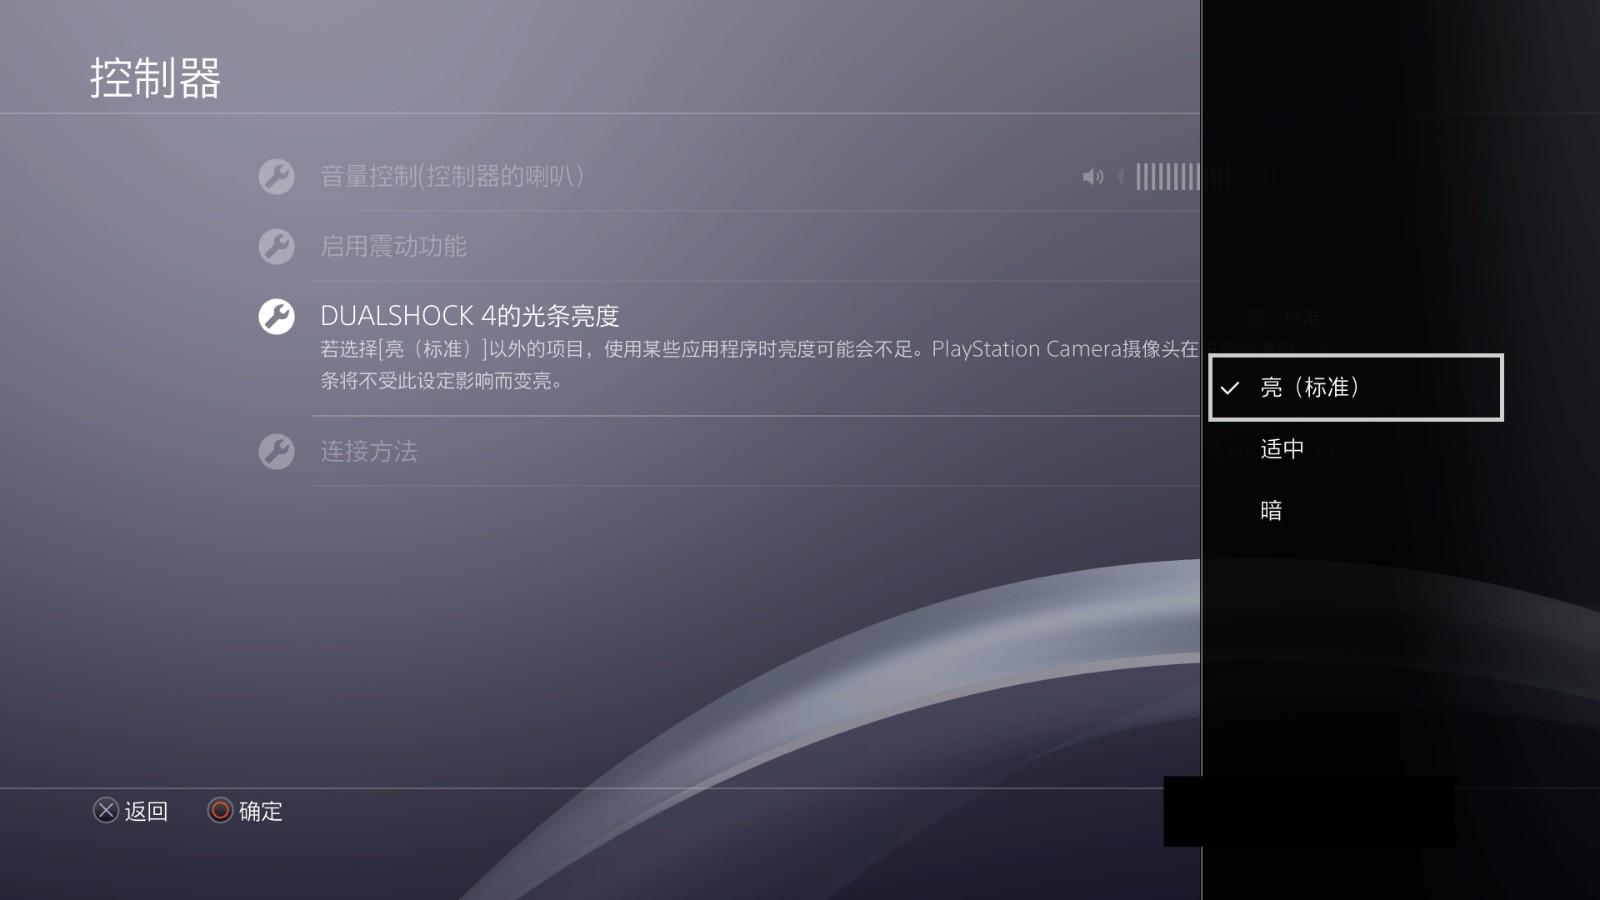 "PS官推分享PS4豆知识 炸出一片玩家""这么多年PS4白玩了!"""